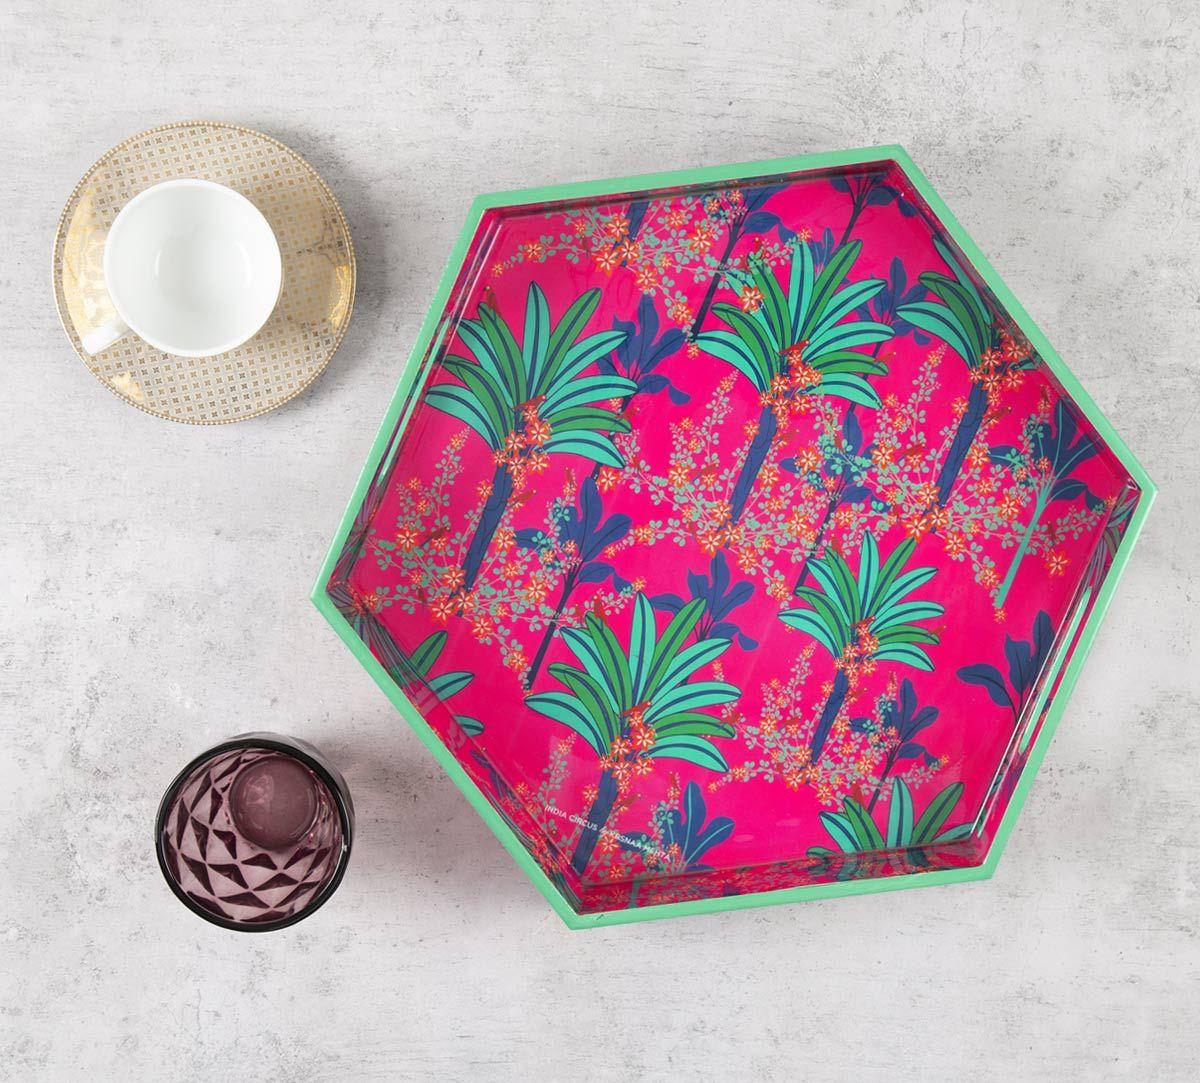 India Circus Royal Palms Hexagon Serving Tray